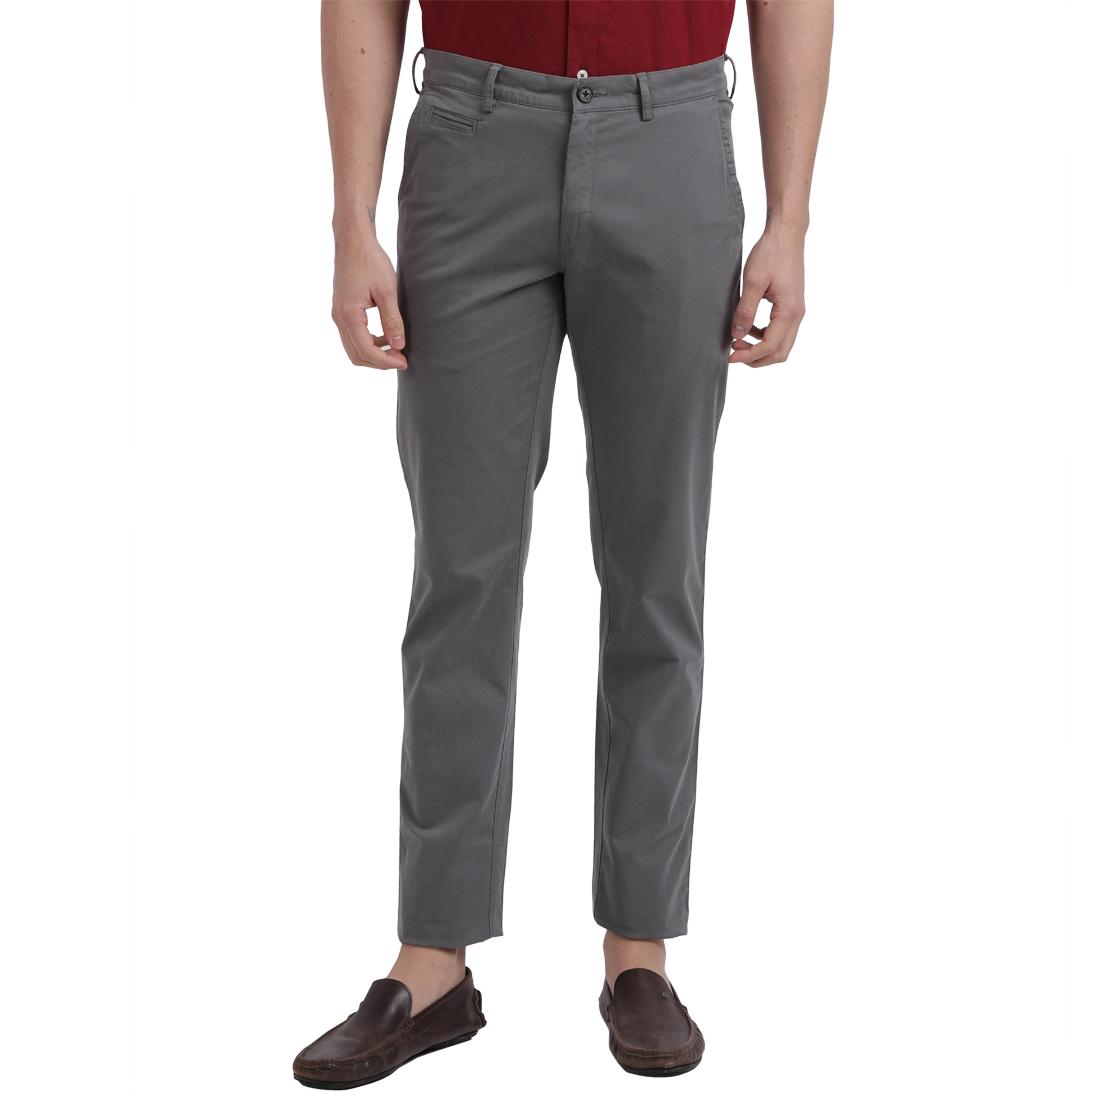 ColorPlus   ColorPlus Grey Trousers